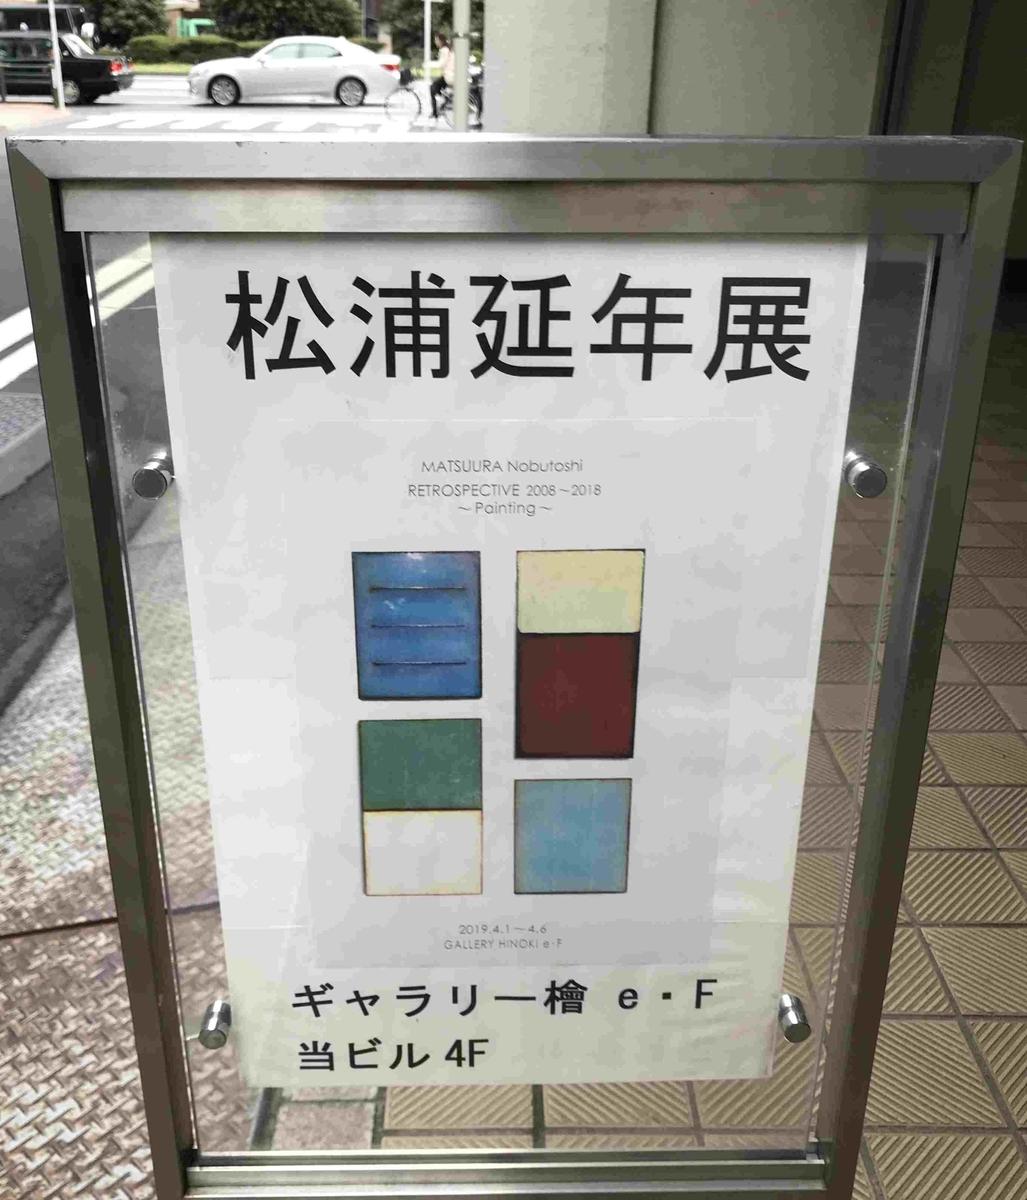 f:id:ryuuzanshi:20190402144529j:plain